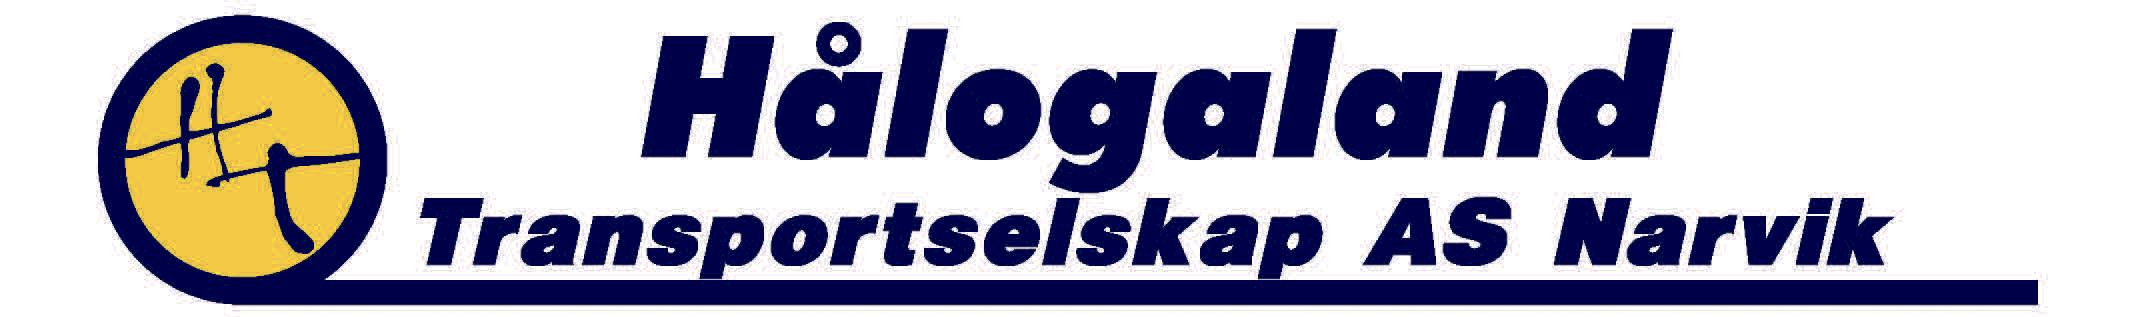 Hålogaland Transportselskap AS Narvik logo